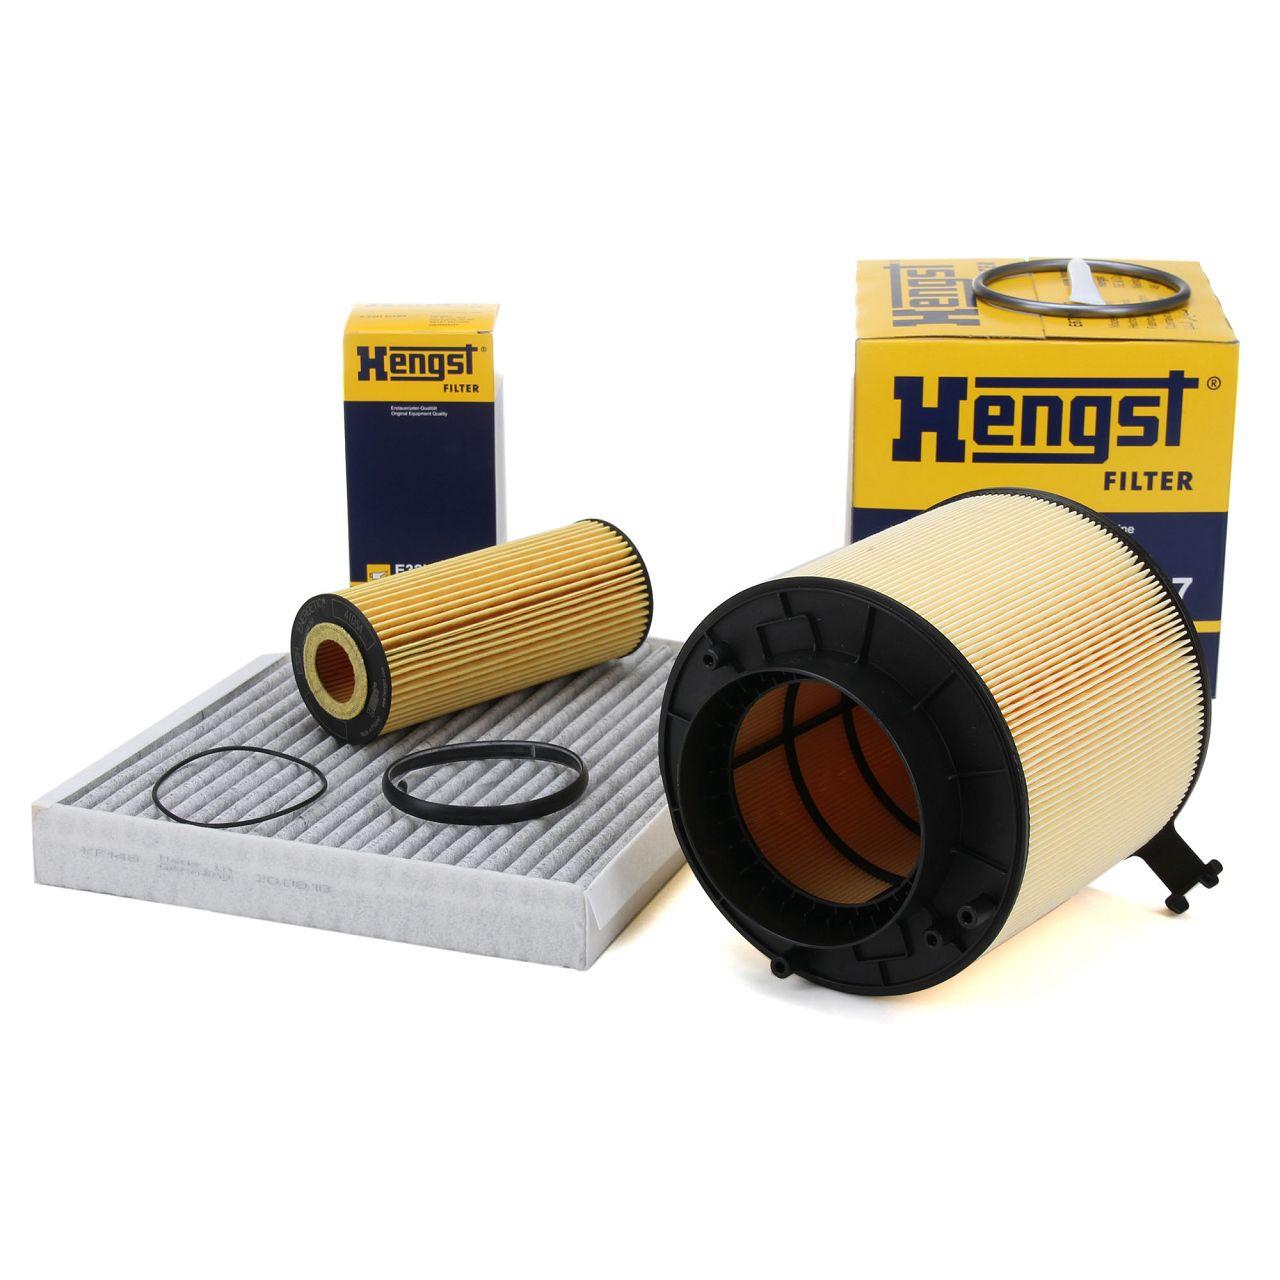 Filterset für AUDI A4 (B8) A5 (8T 8F) Q5 (8RB) 3.0 TFSI 3.2 FSI S4 S5 SQ5 TFSI